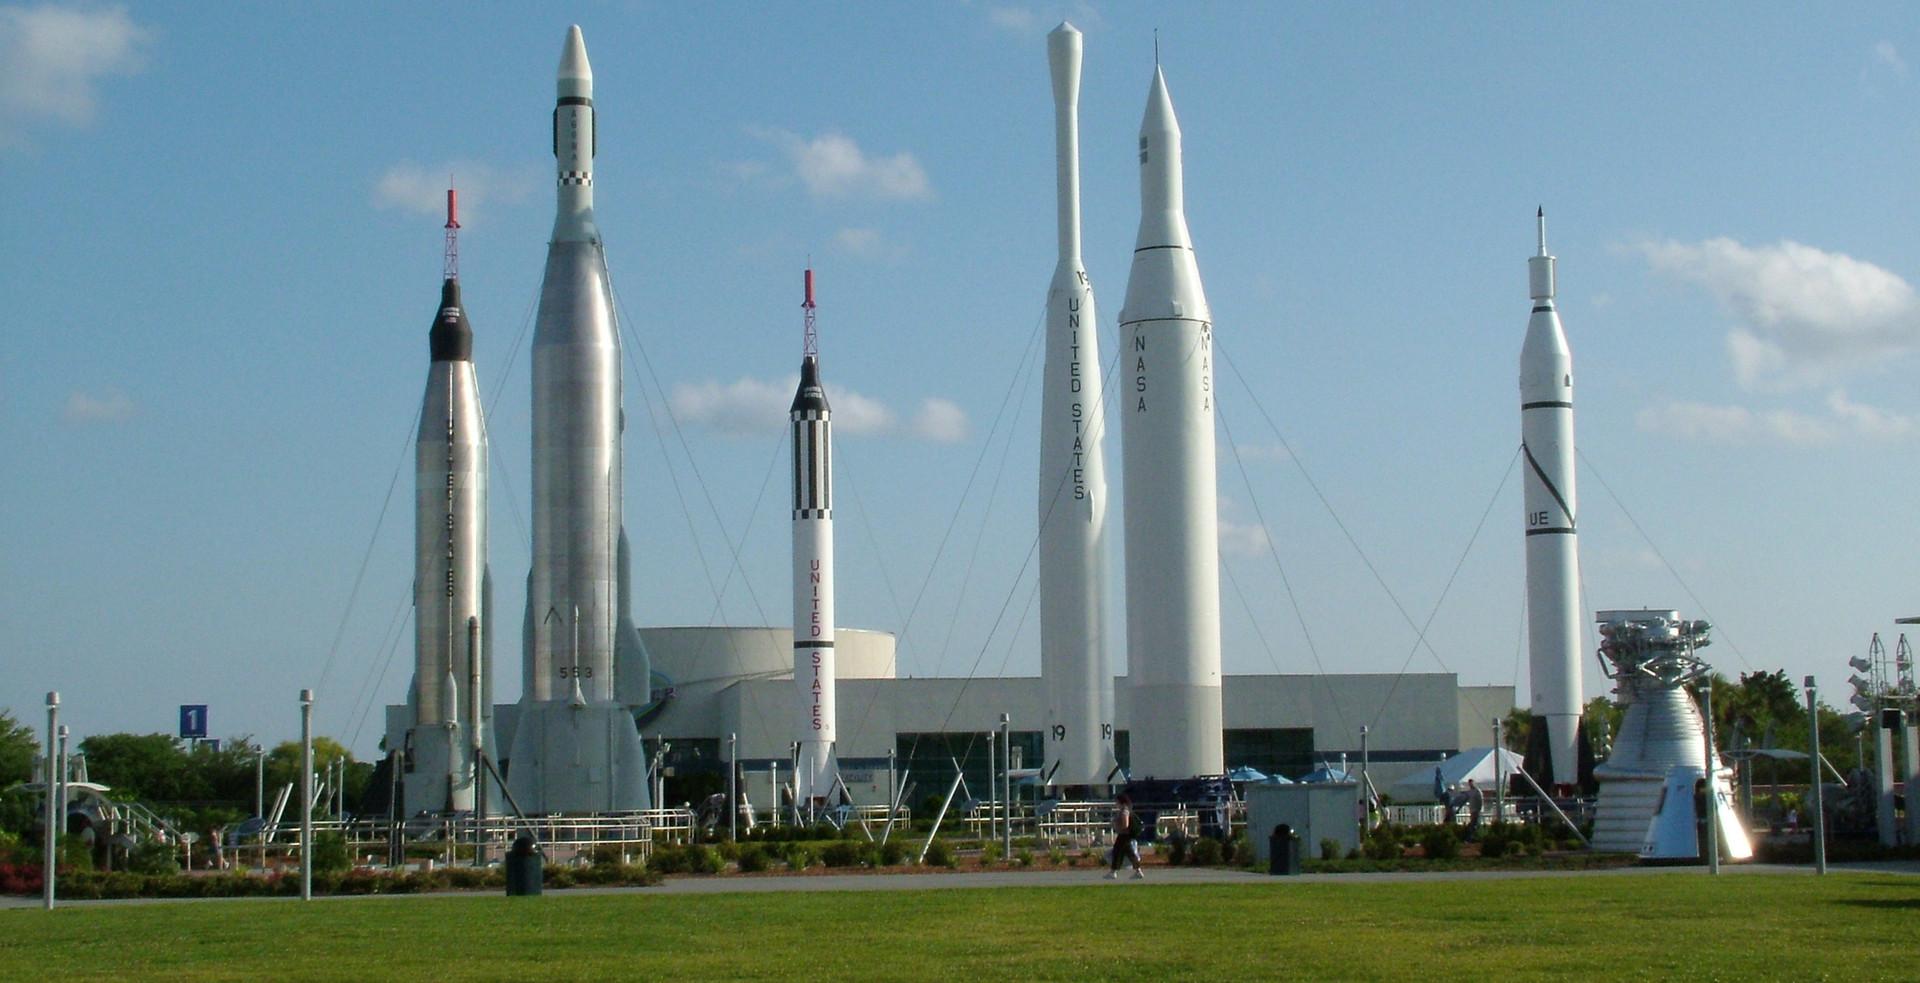 Rocket Garden at The Kennedy Space Center